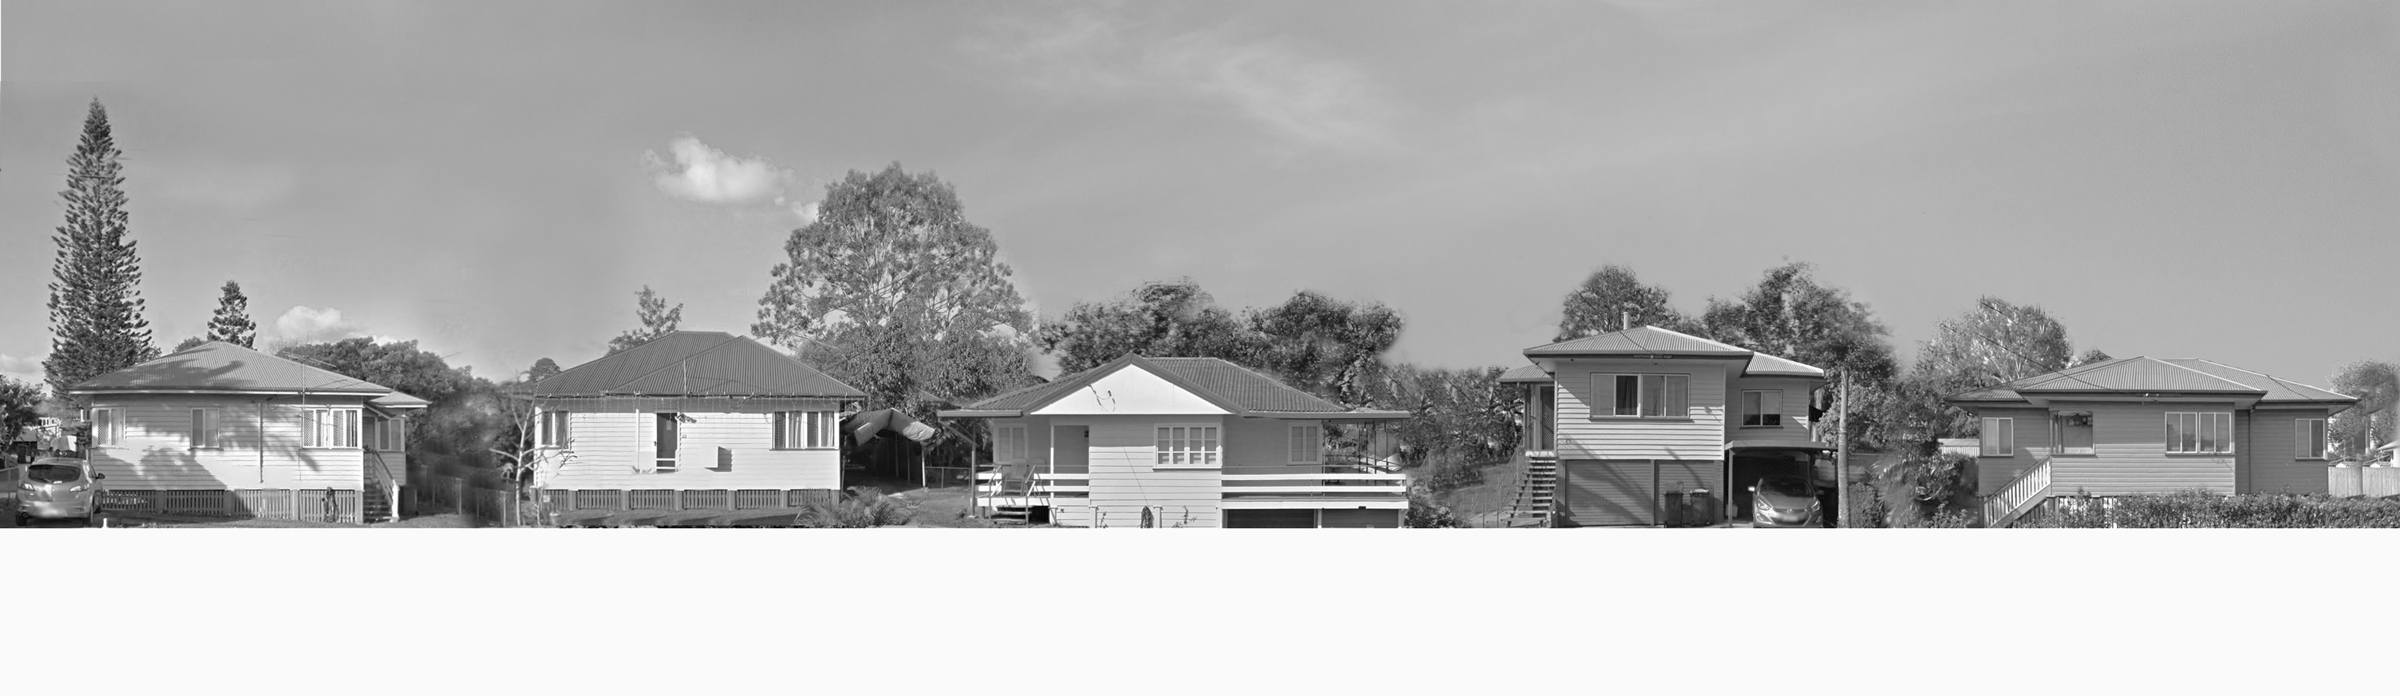 M1715-171212-Dappled Dwellings-D02B.jpg